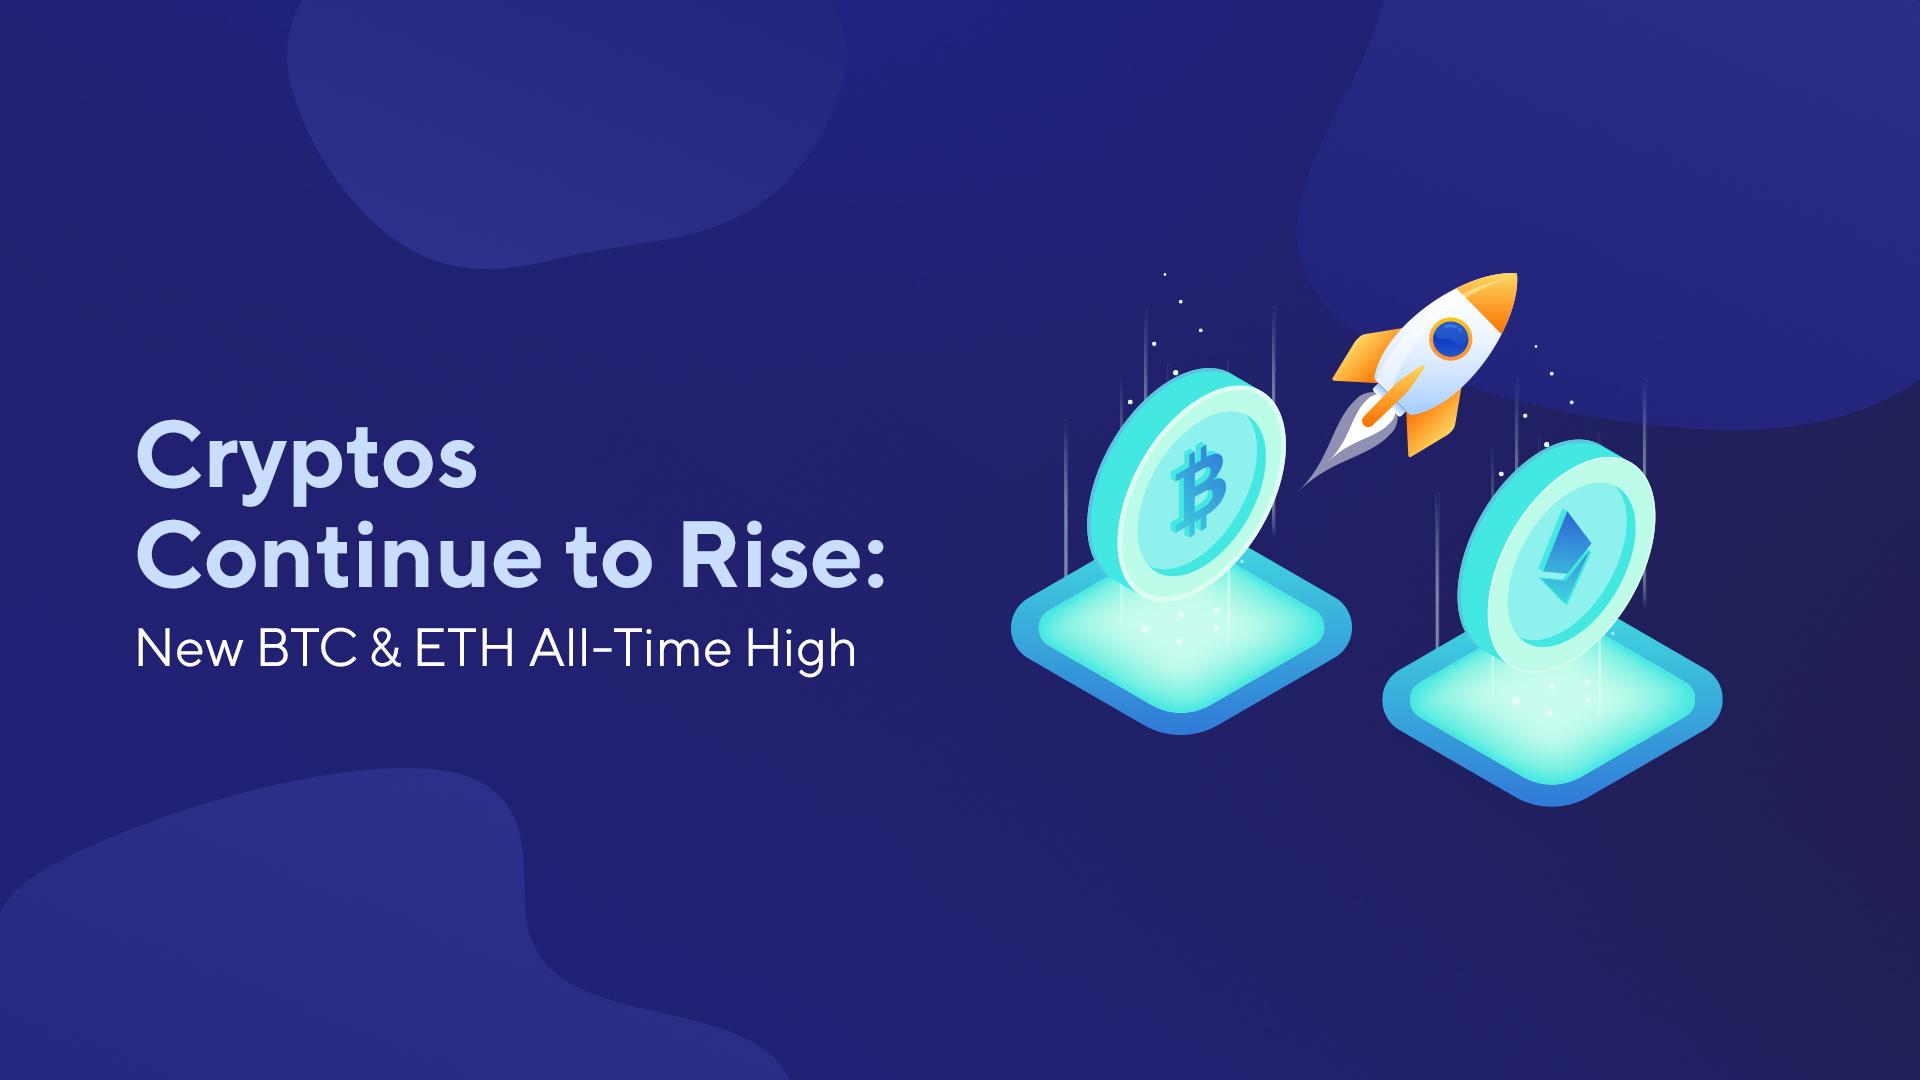 Cryptos Continue to Rise: New BTC & ETH All-Time High